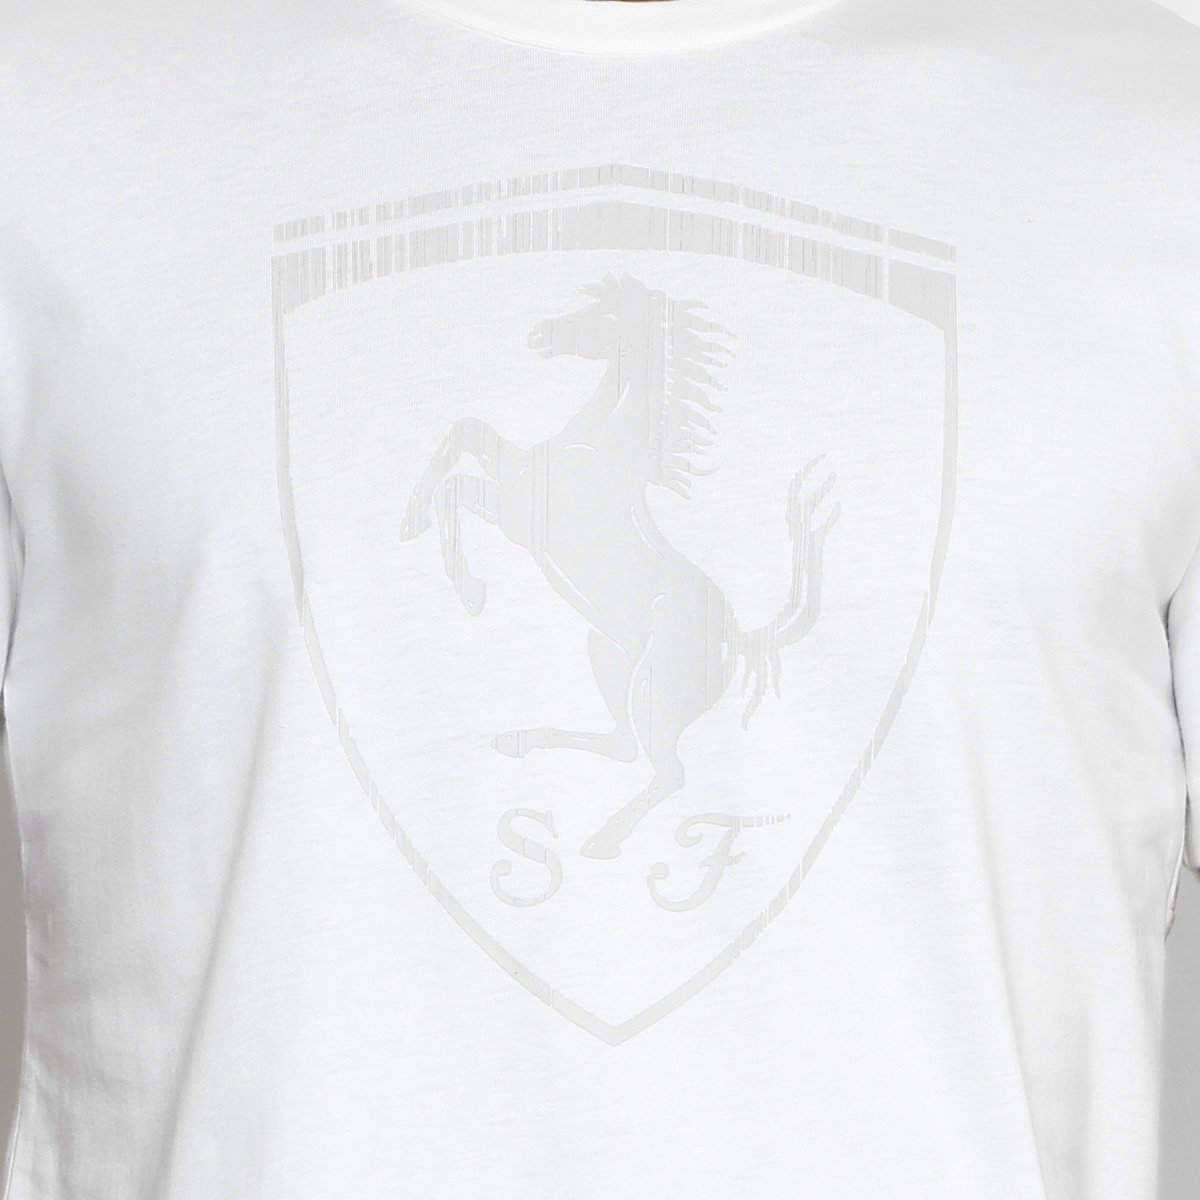 309a3e52c3 4025f75d387839  Camiseta Puma Ferrari Big Shield Masculina - Compre Agora  Netshoes 2c4d167048ec6d  Camiseta Puma Scuderia ...